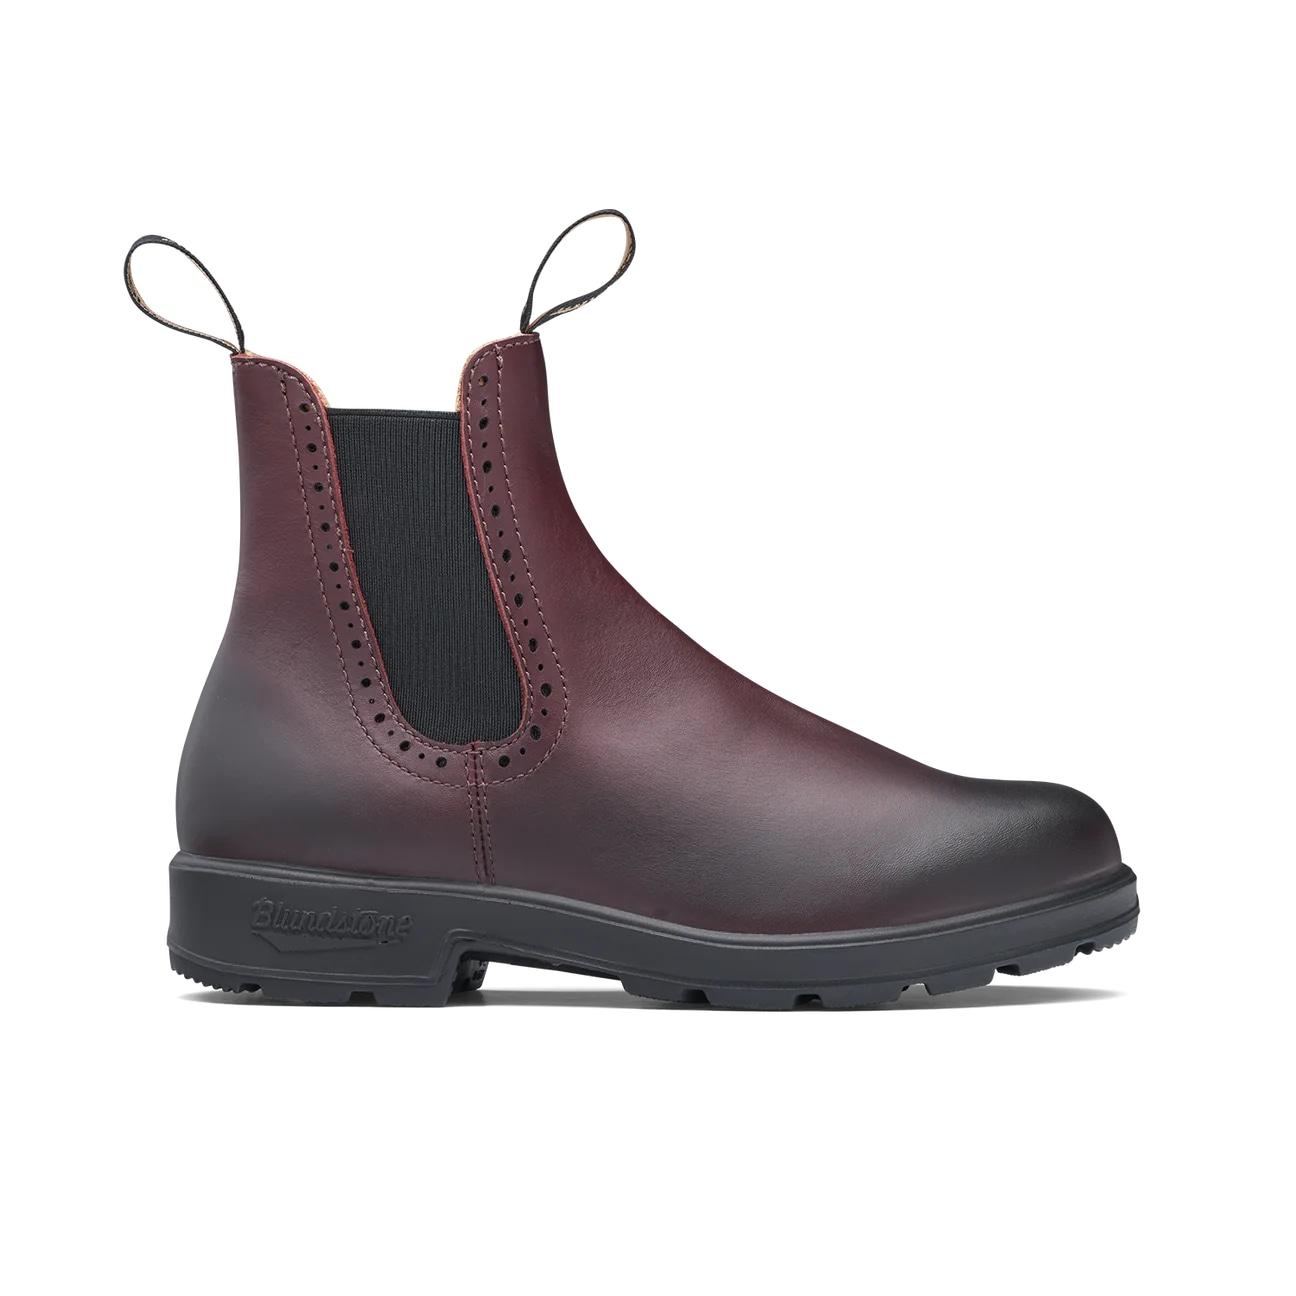 Series Boot Shiraz - Women's